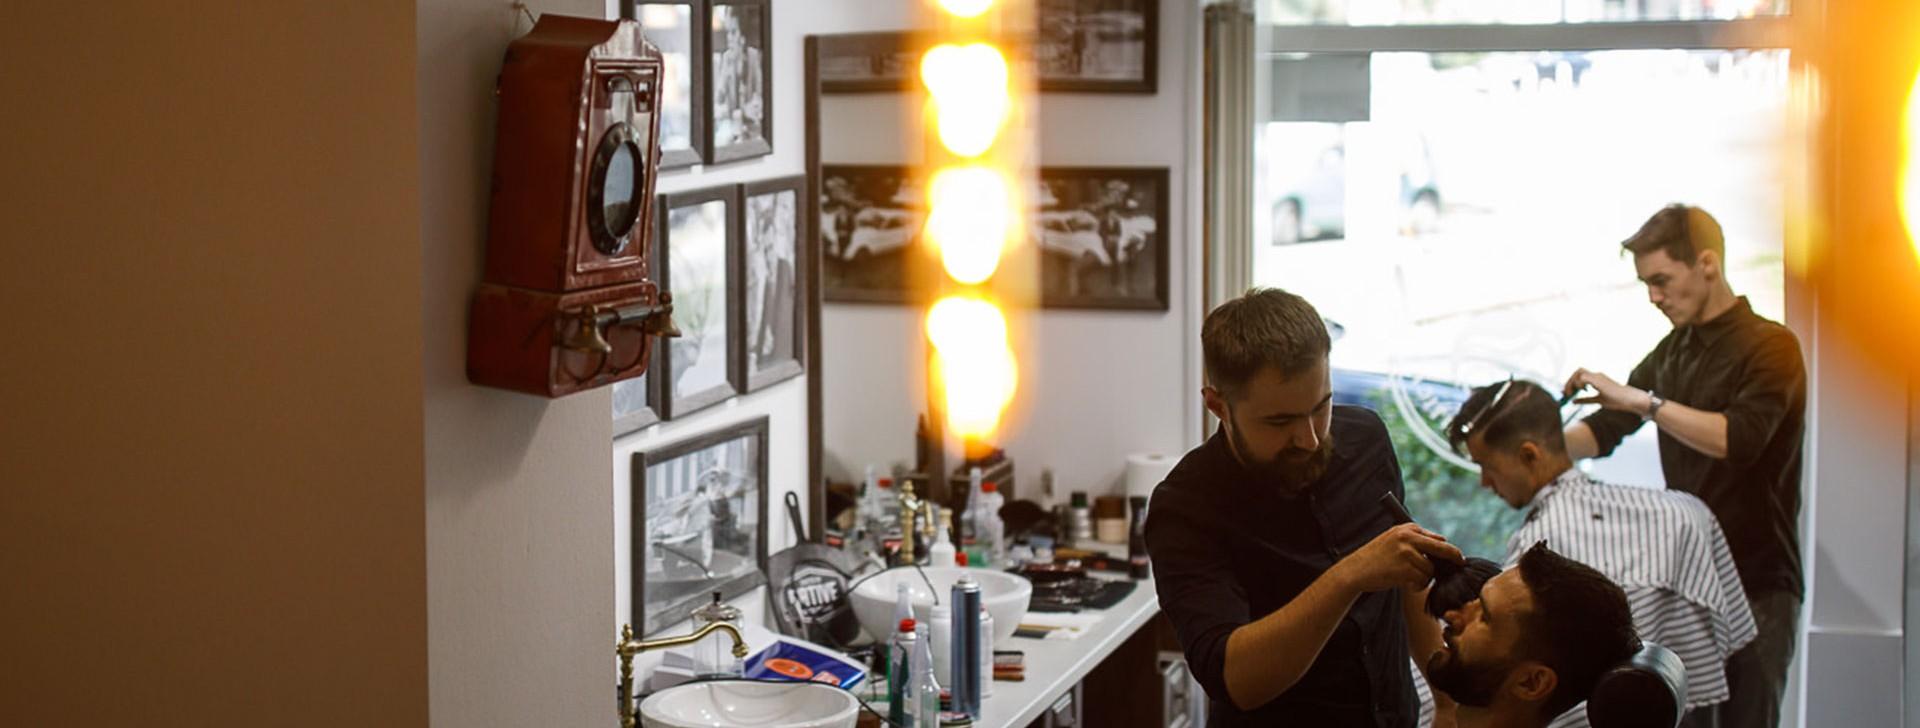 frizerie-the-barber-barbershop-60